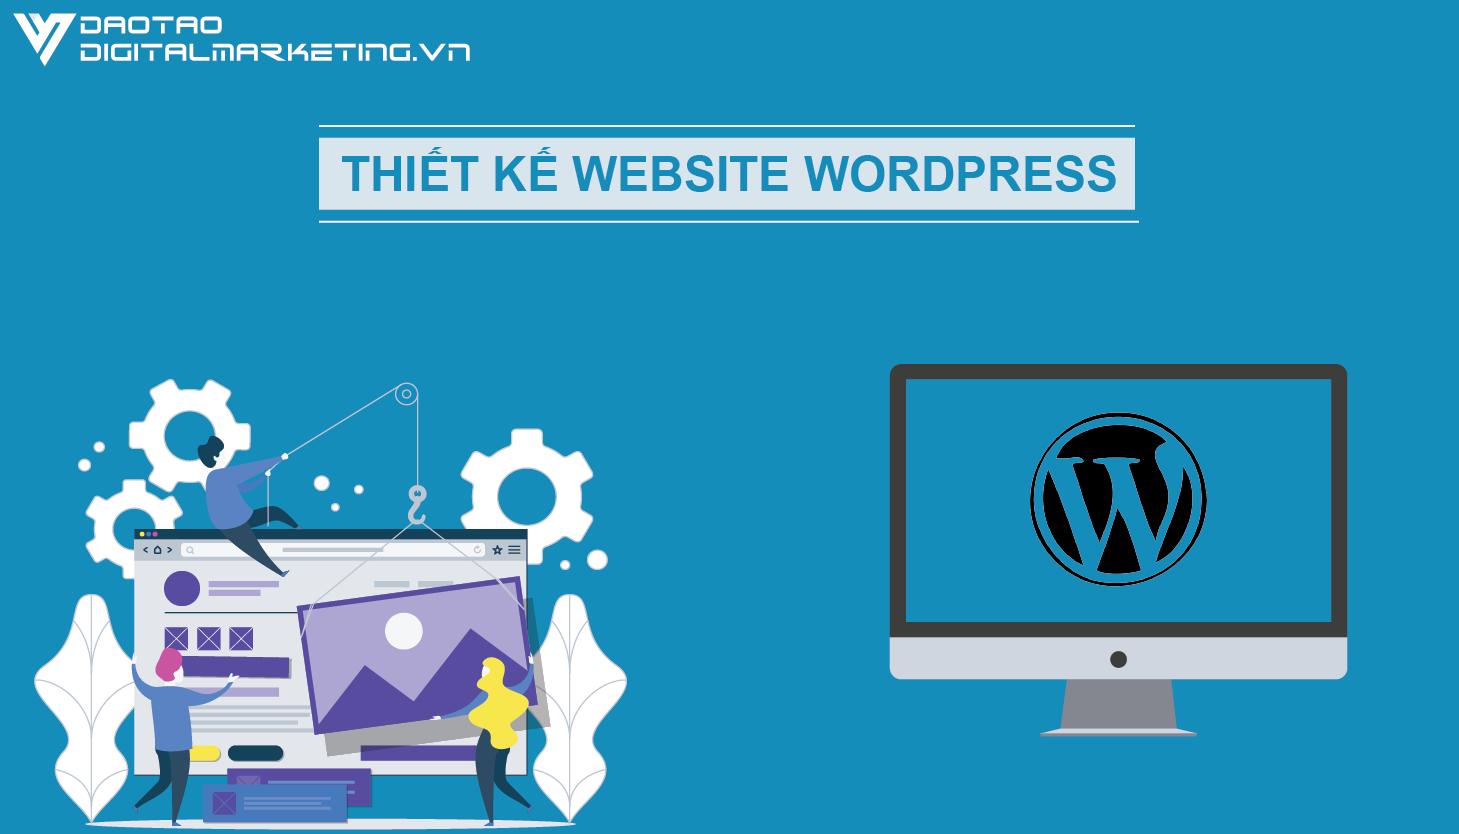 khoa-hoc-Wordpress-trung-tam-dao-tao-digital-marketing